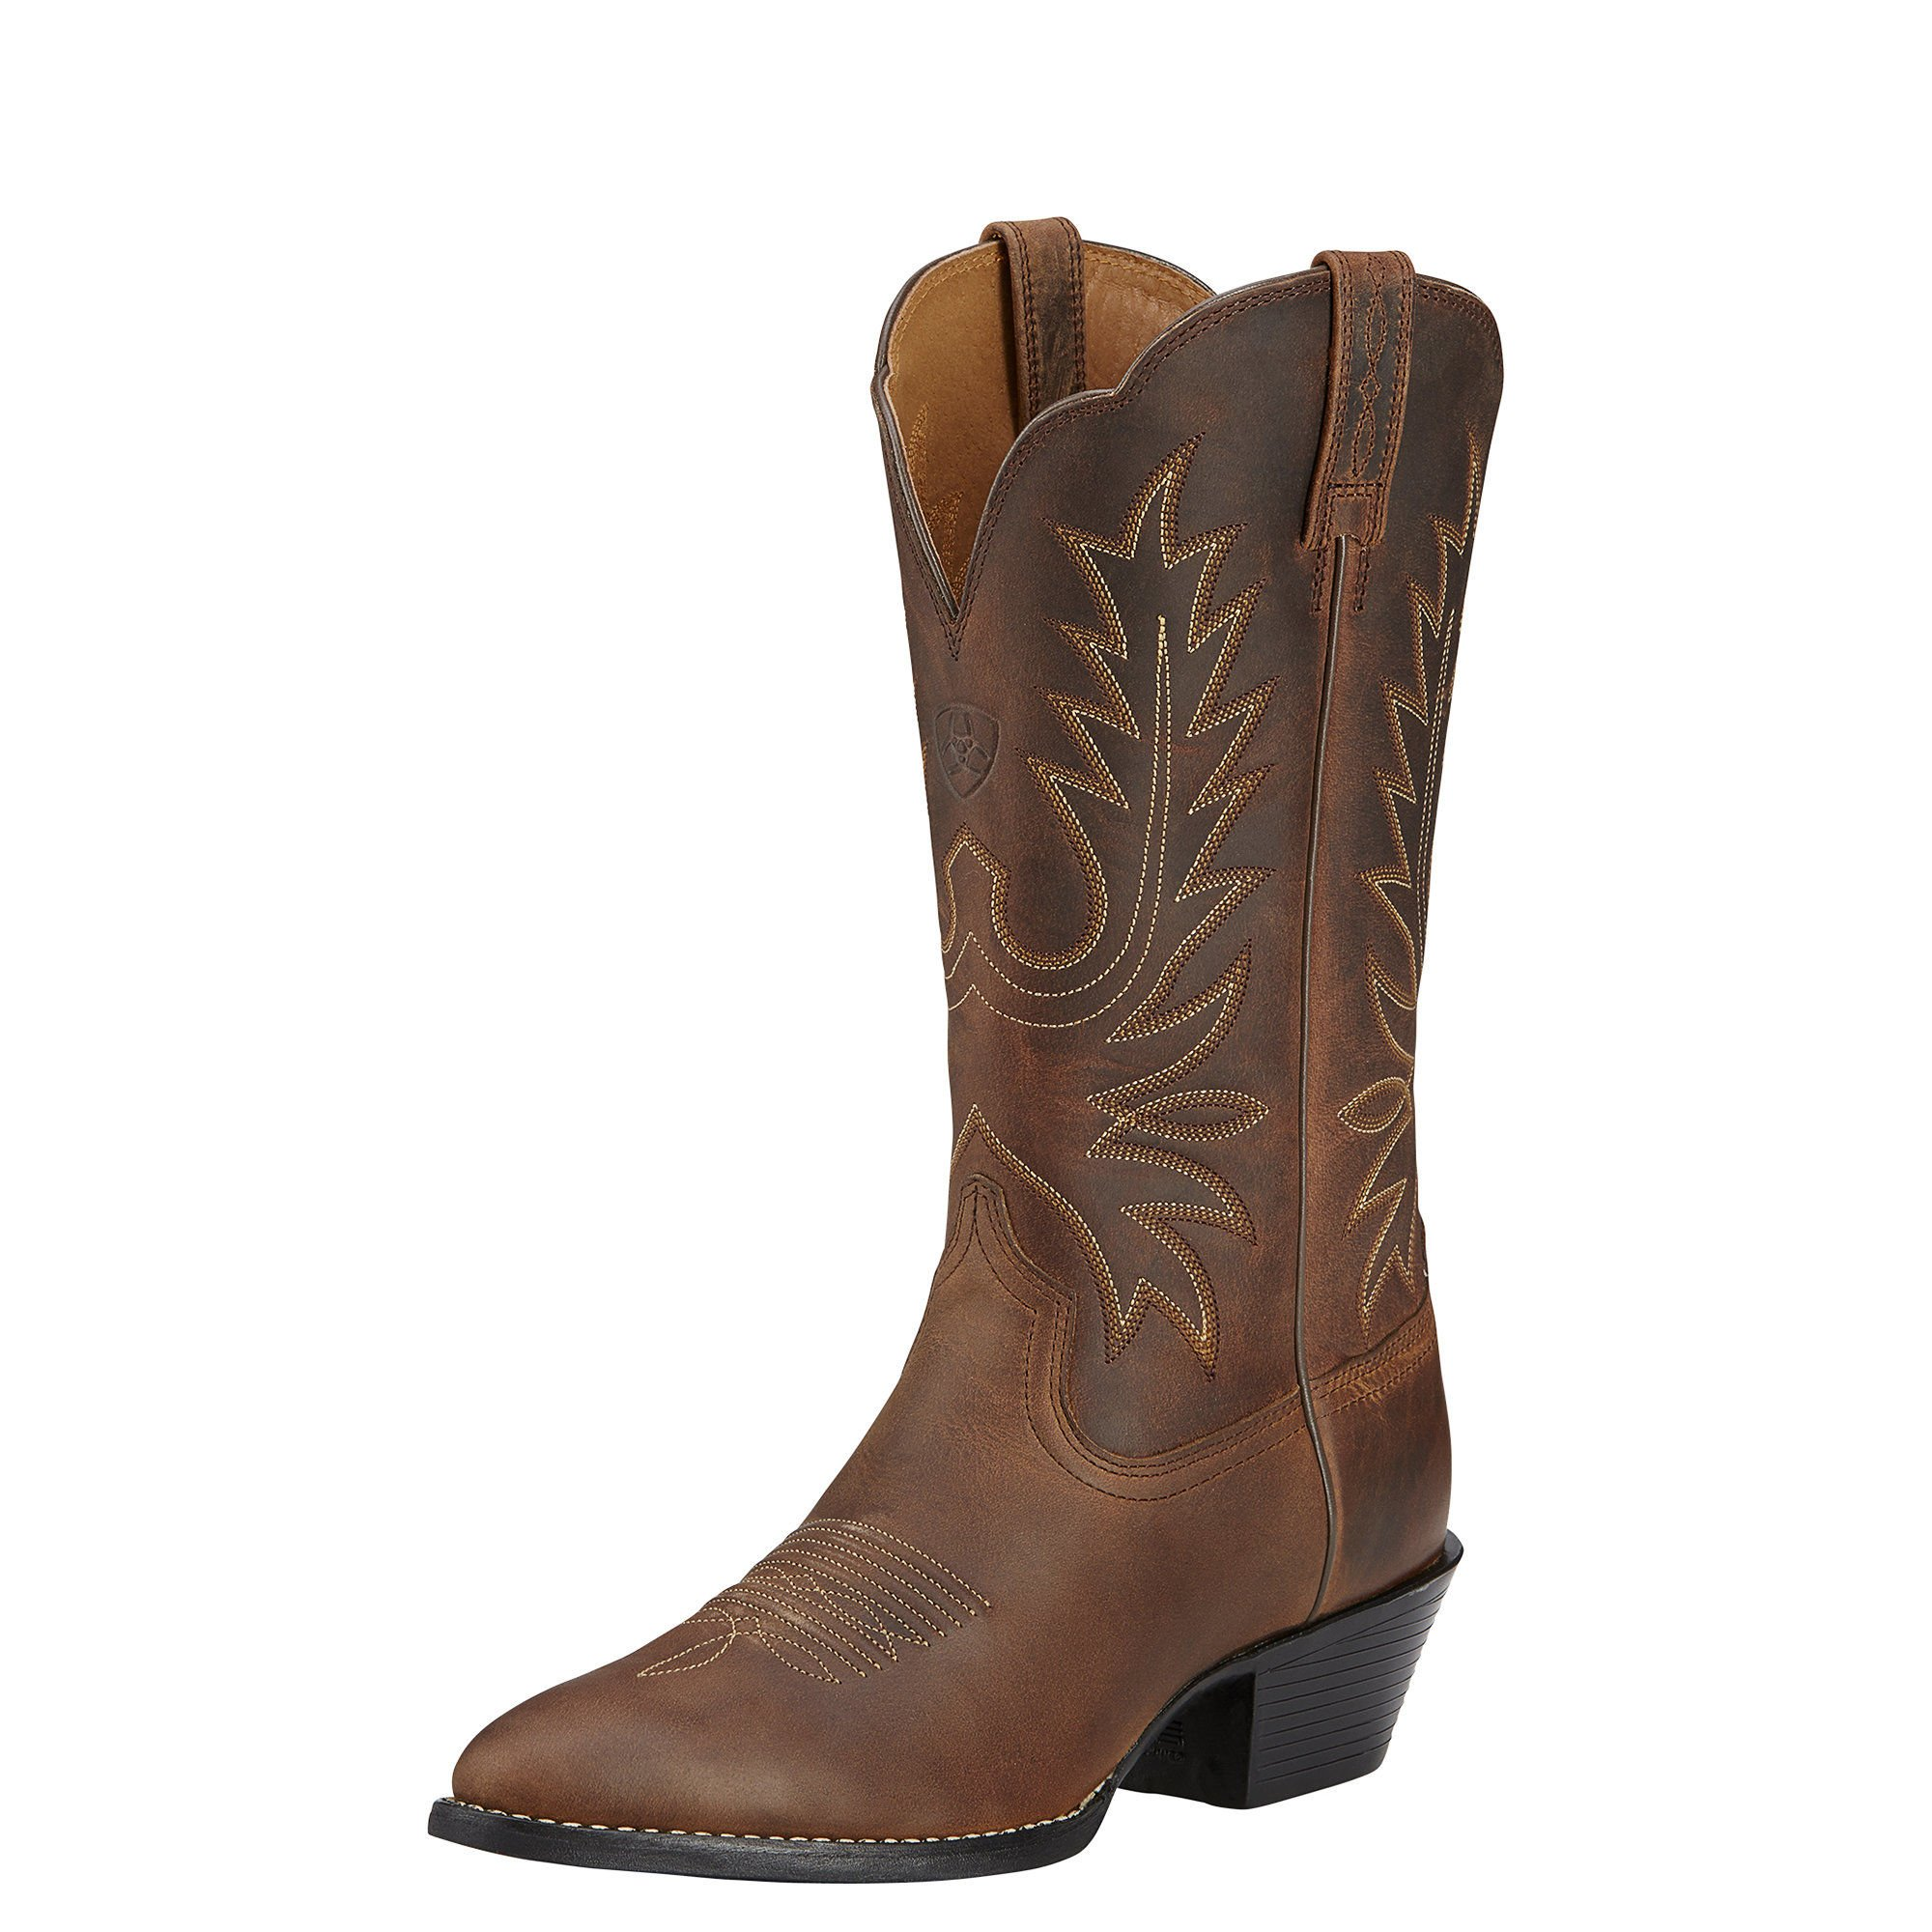 Ariat Women's Heritage Western R Toe Western Cowboy Boot, Distressed Brown, 8.5 B US